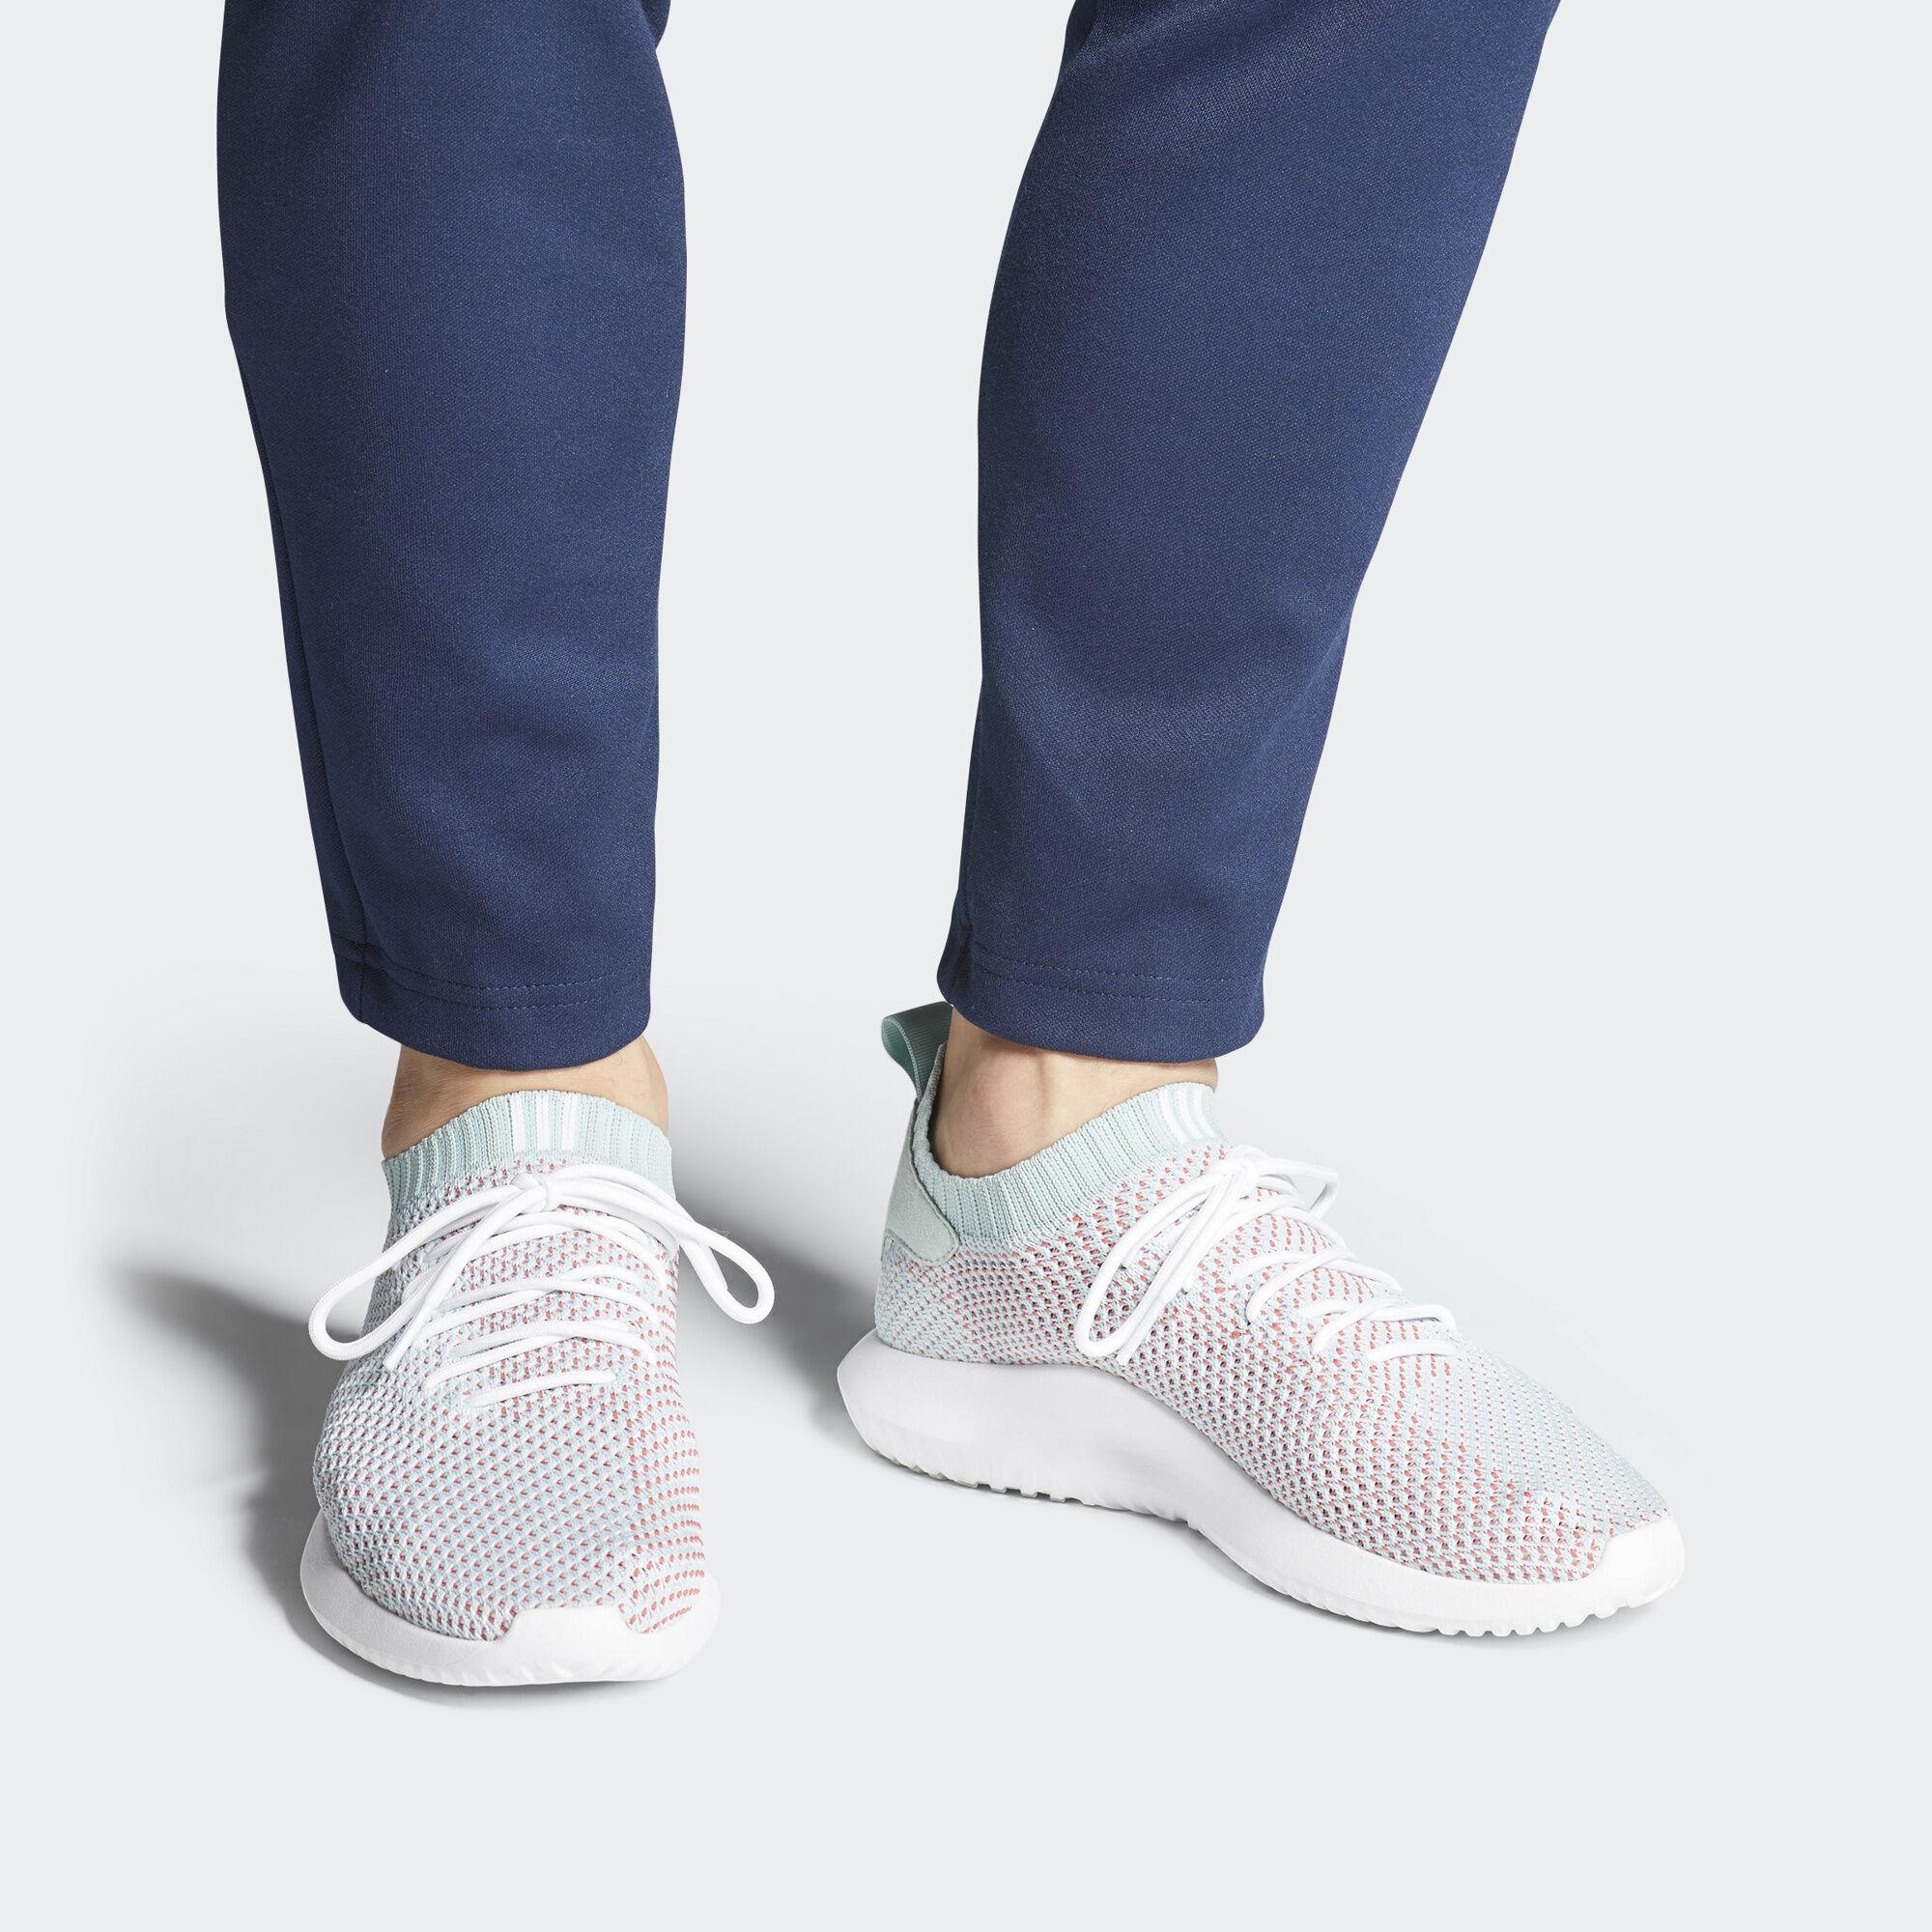 quality design ecb19 2ba24 adidas Tubular Shadow Primeknit Shoes - Black  adidas Switze